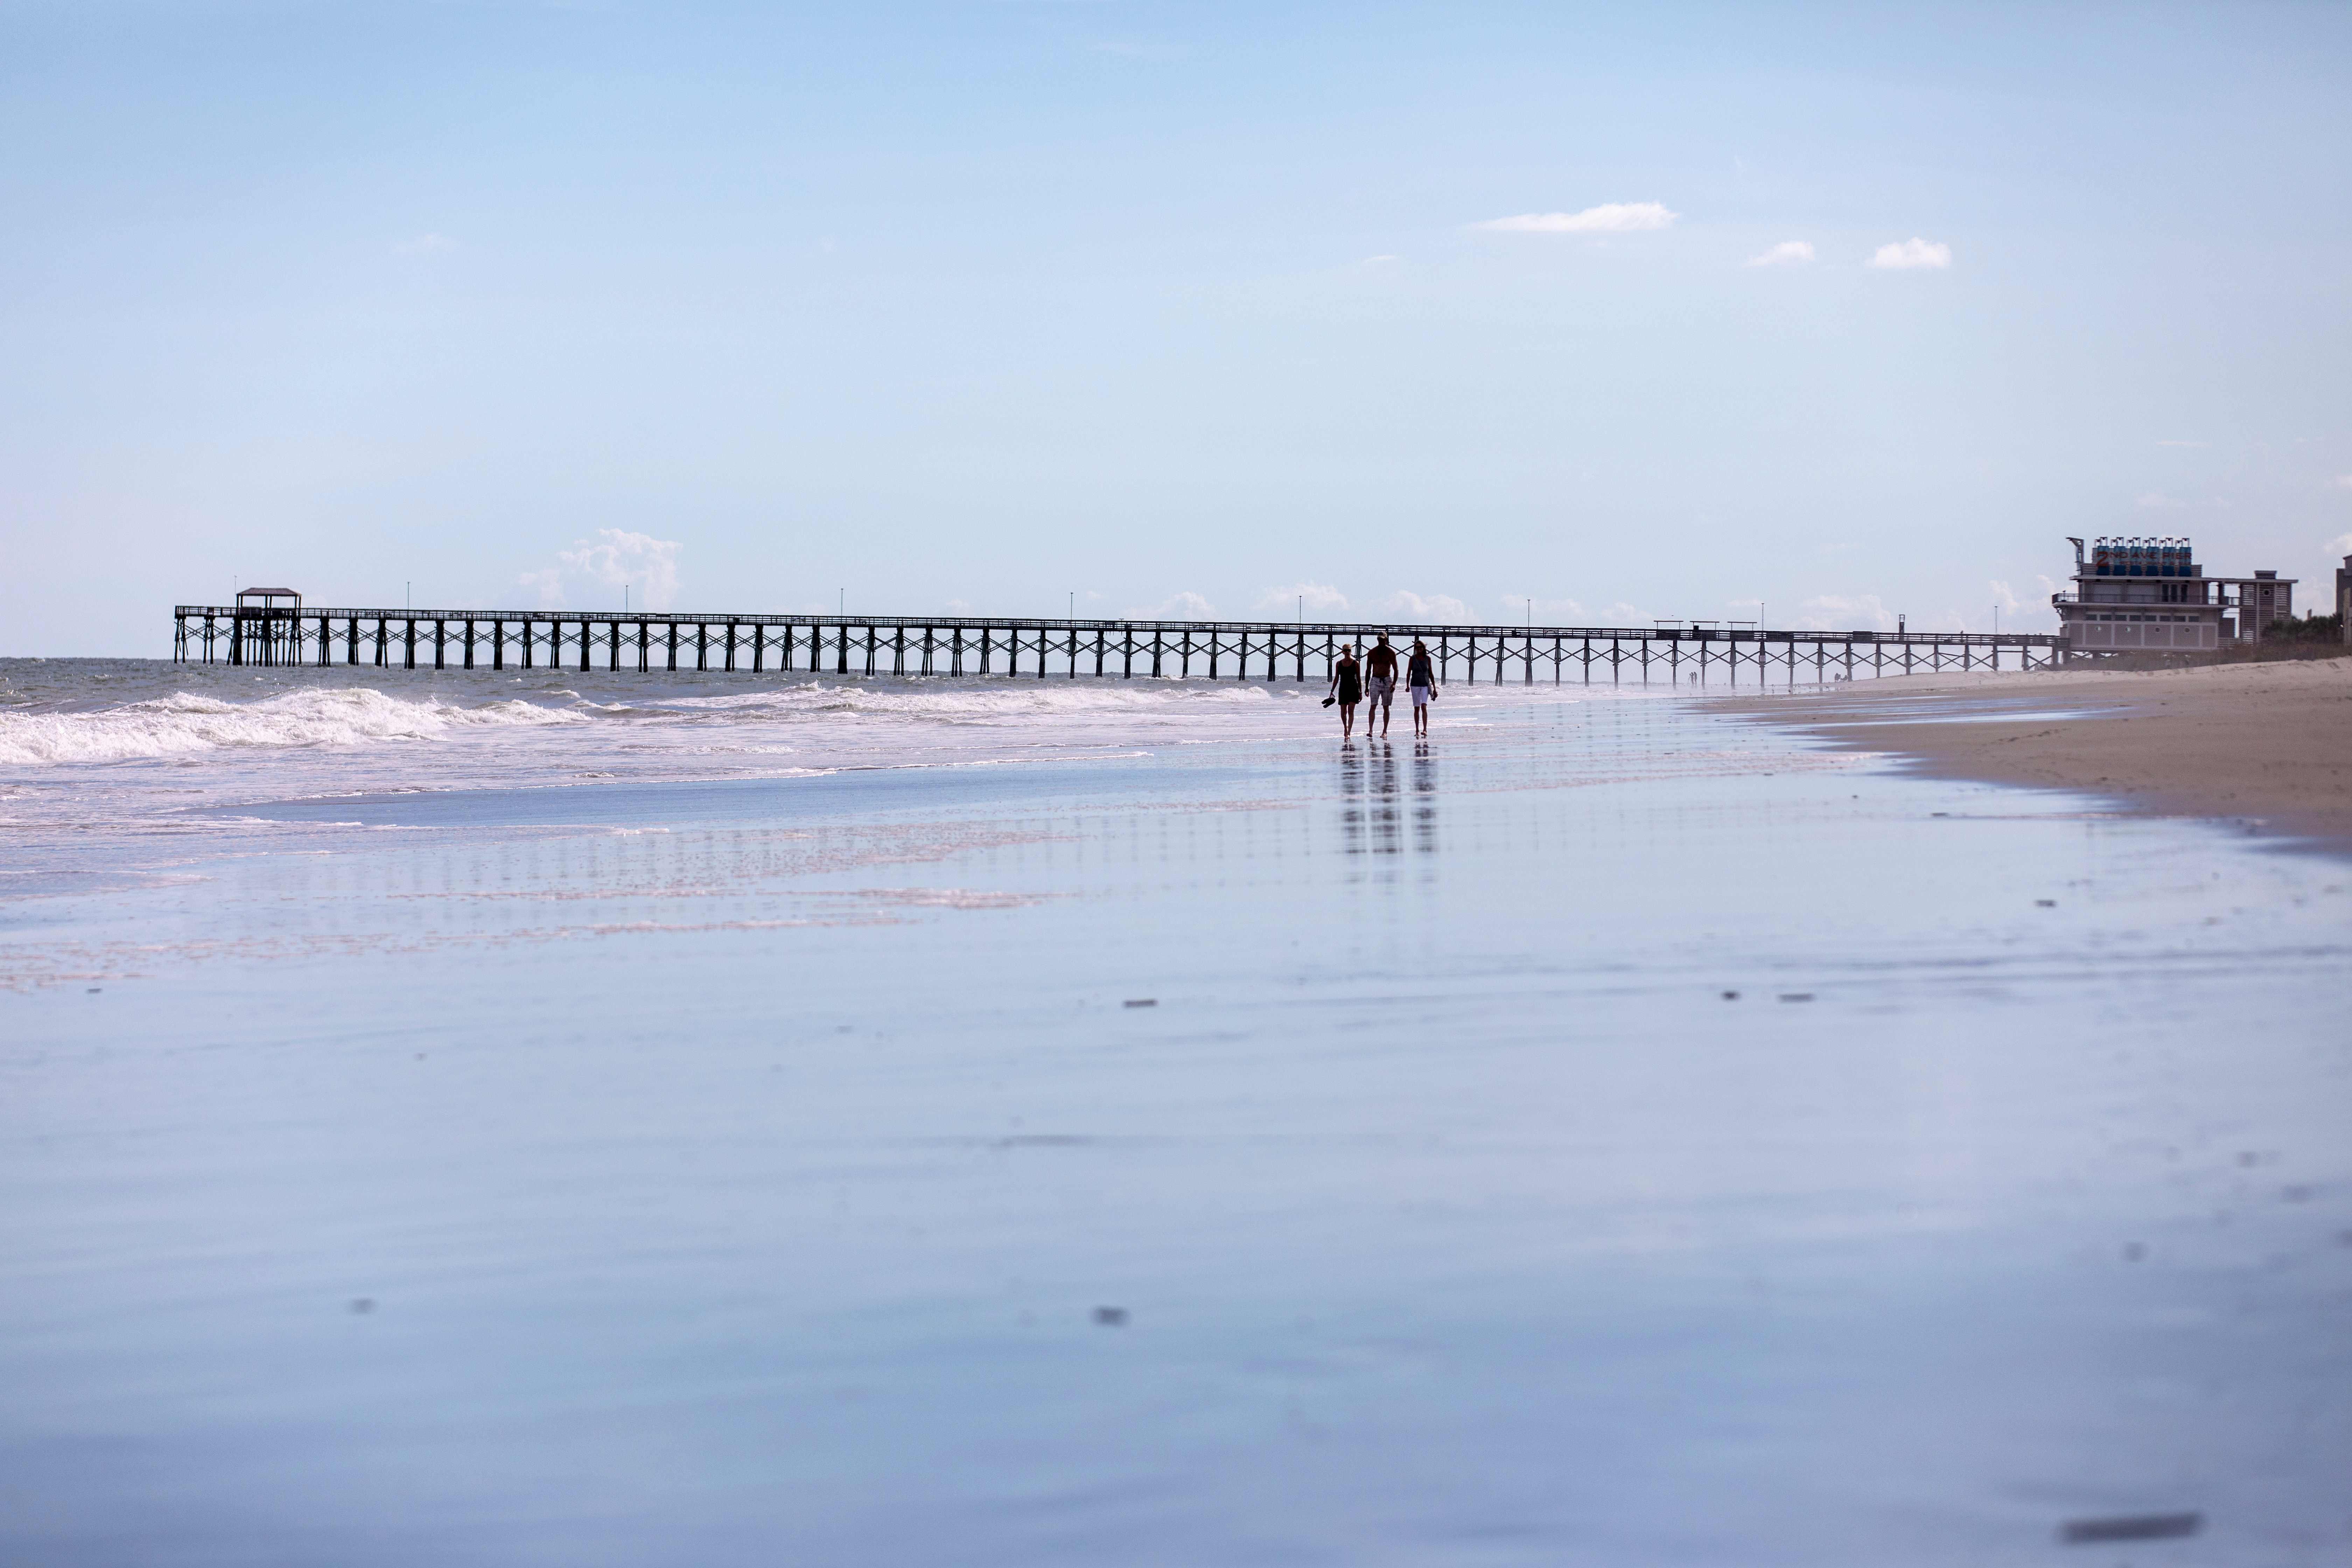 شاطى ميرتل بيتش